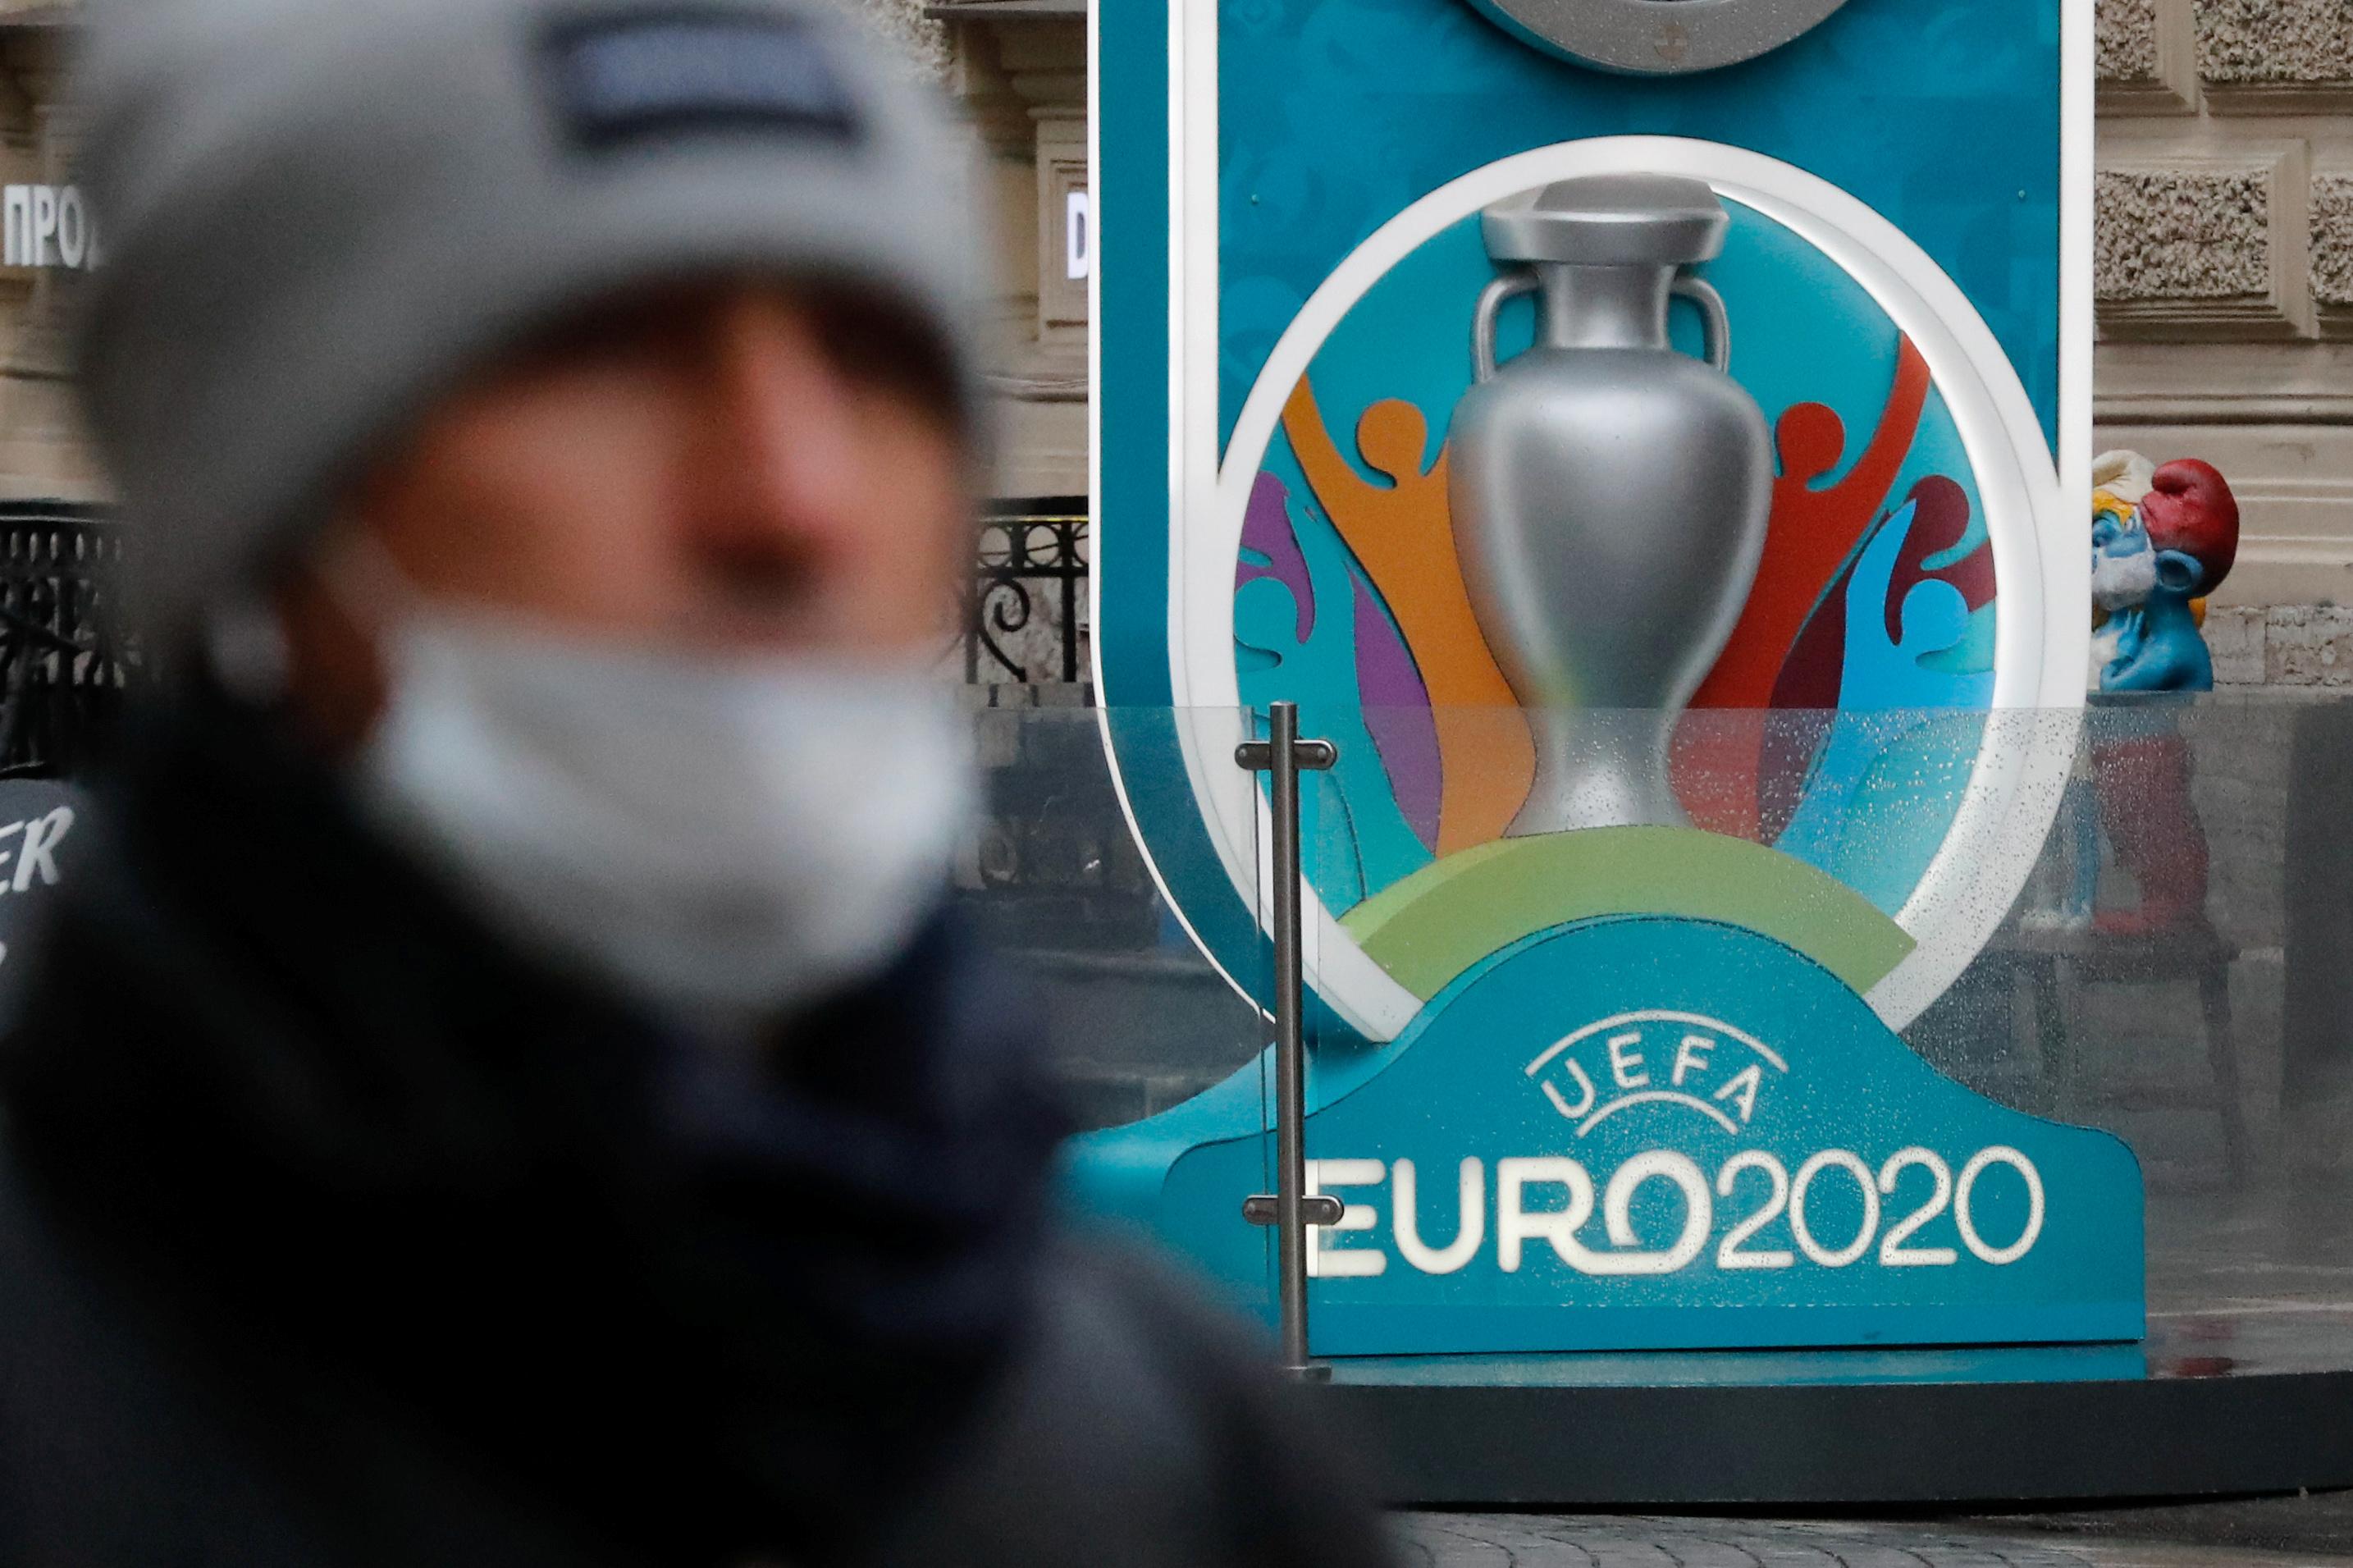 Football - Euro 2020 - Coronavirus : l'avenir de l'Euro 2020 (et de la Ligue des champions) se jouera mardi